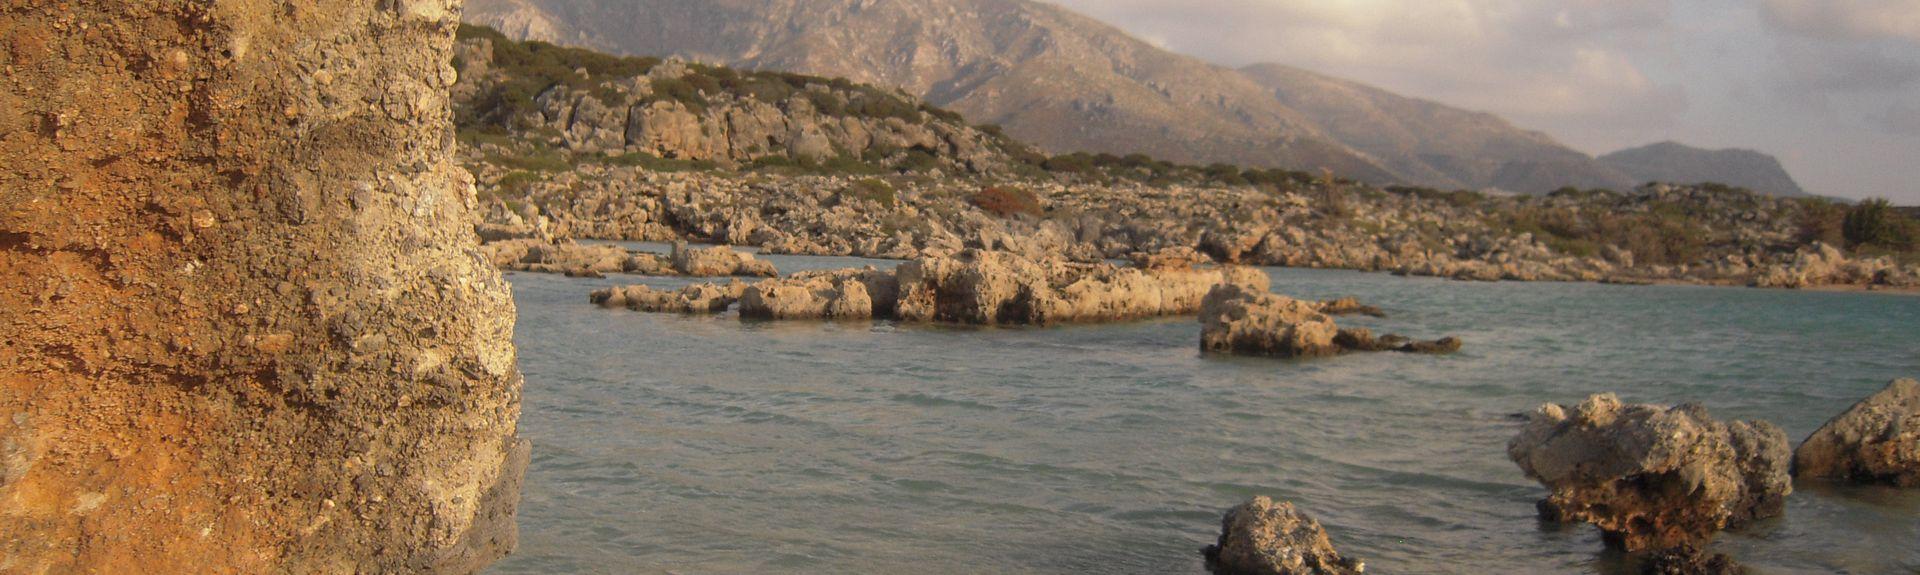 Sfinari, Kissamos, Kreta, Griechenland